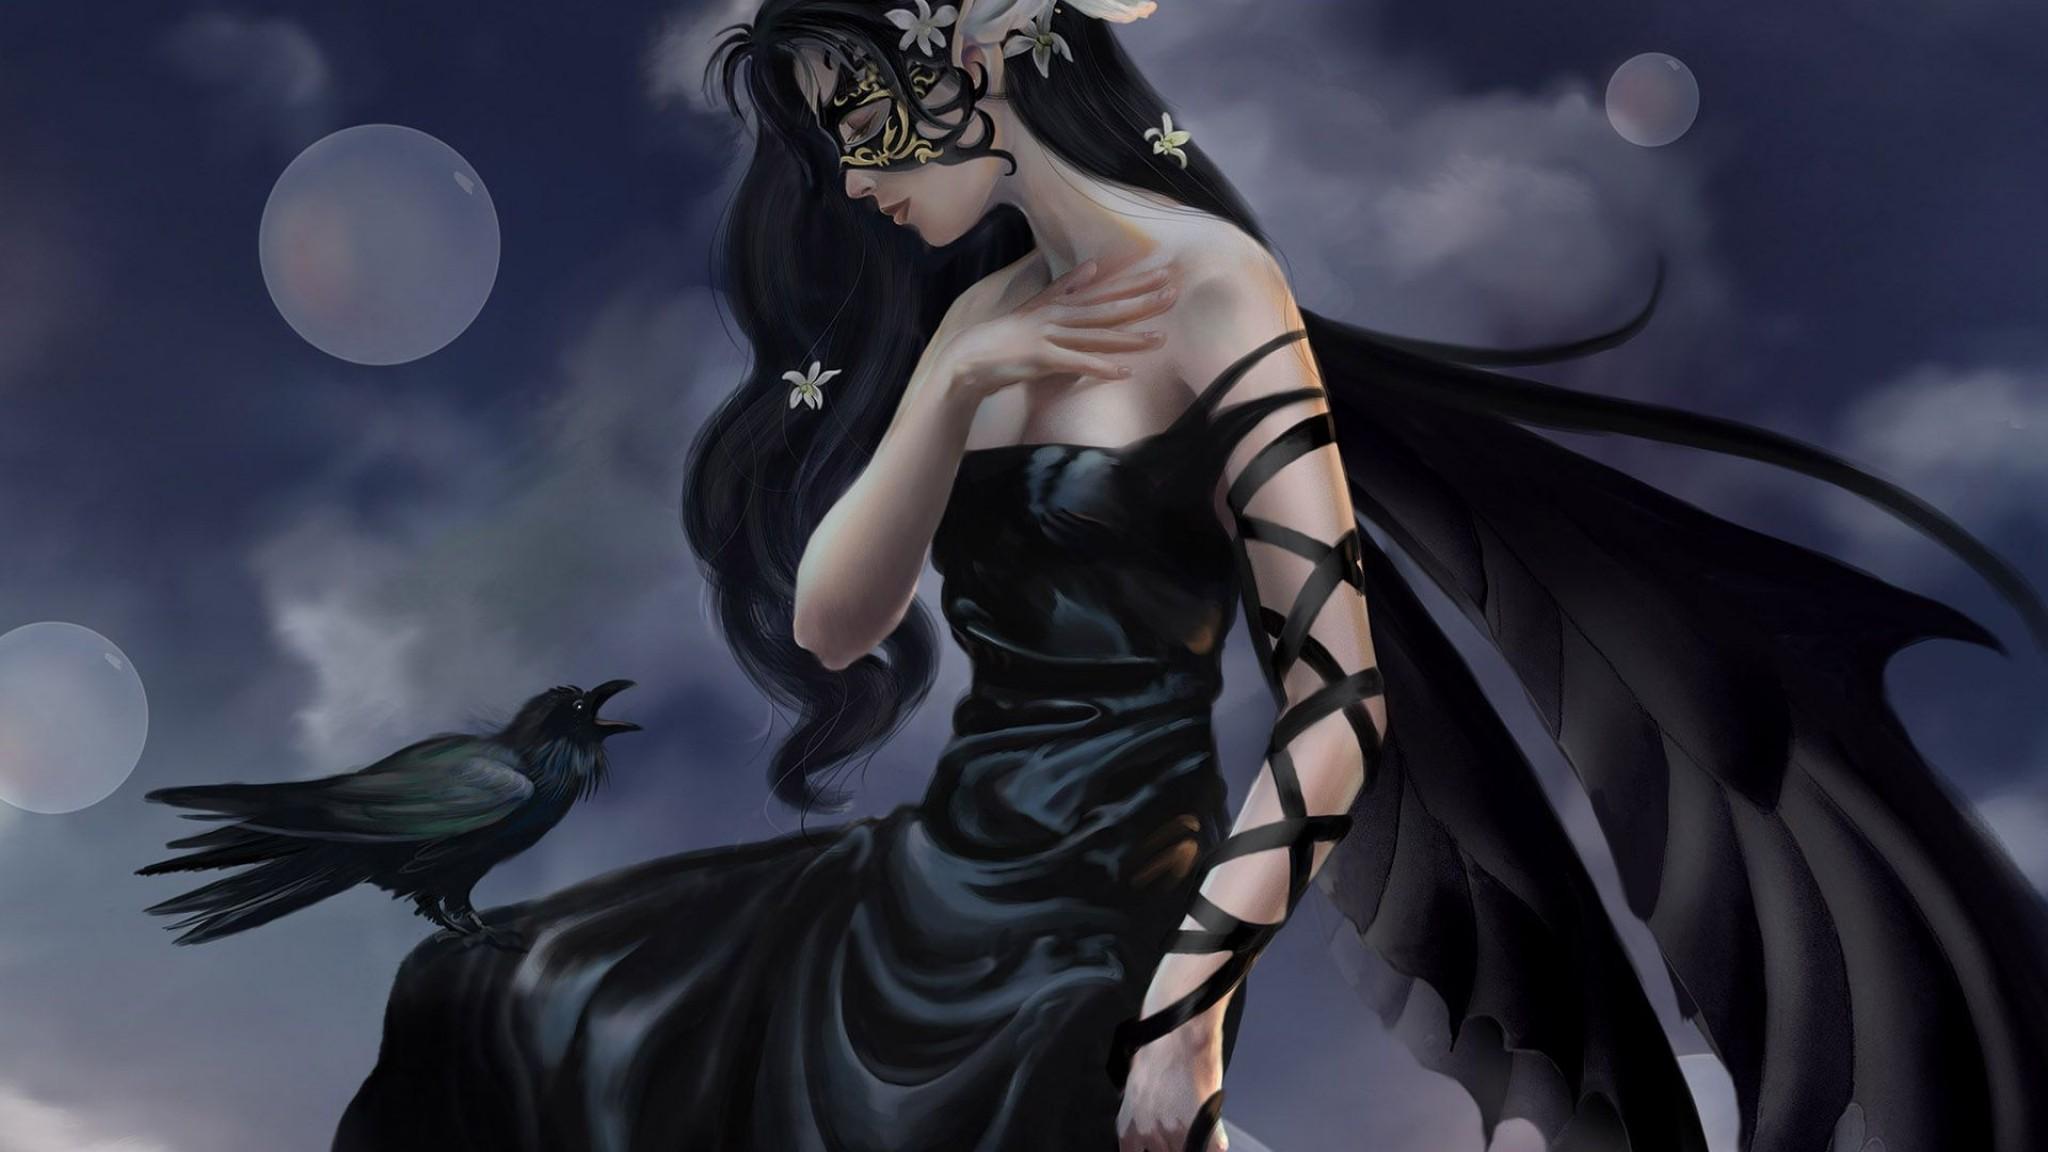 Dark Fairy Wallpapers, wallpaper, Dark Fairy Wallpapers hd ...